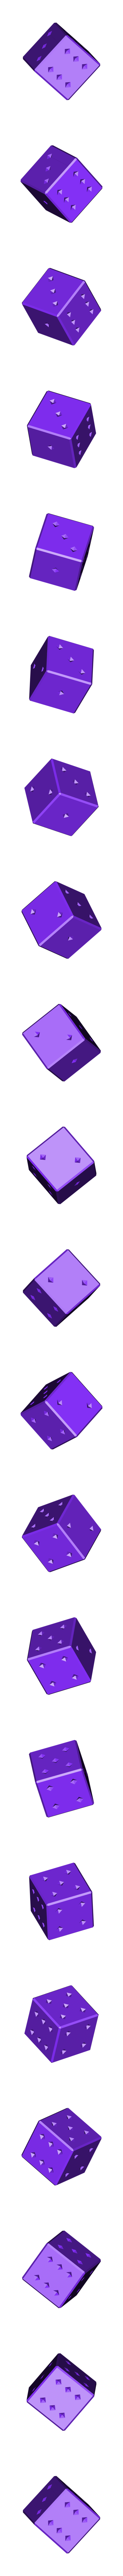 Dice.stl Download free STL file Dice • 3D printable template, 3DBuilder